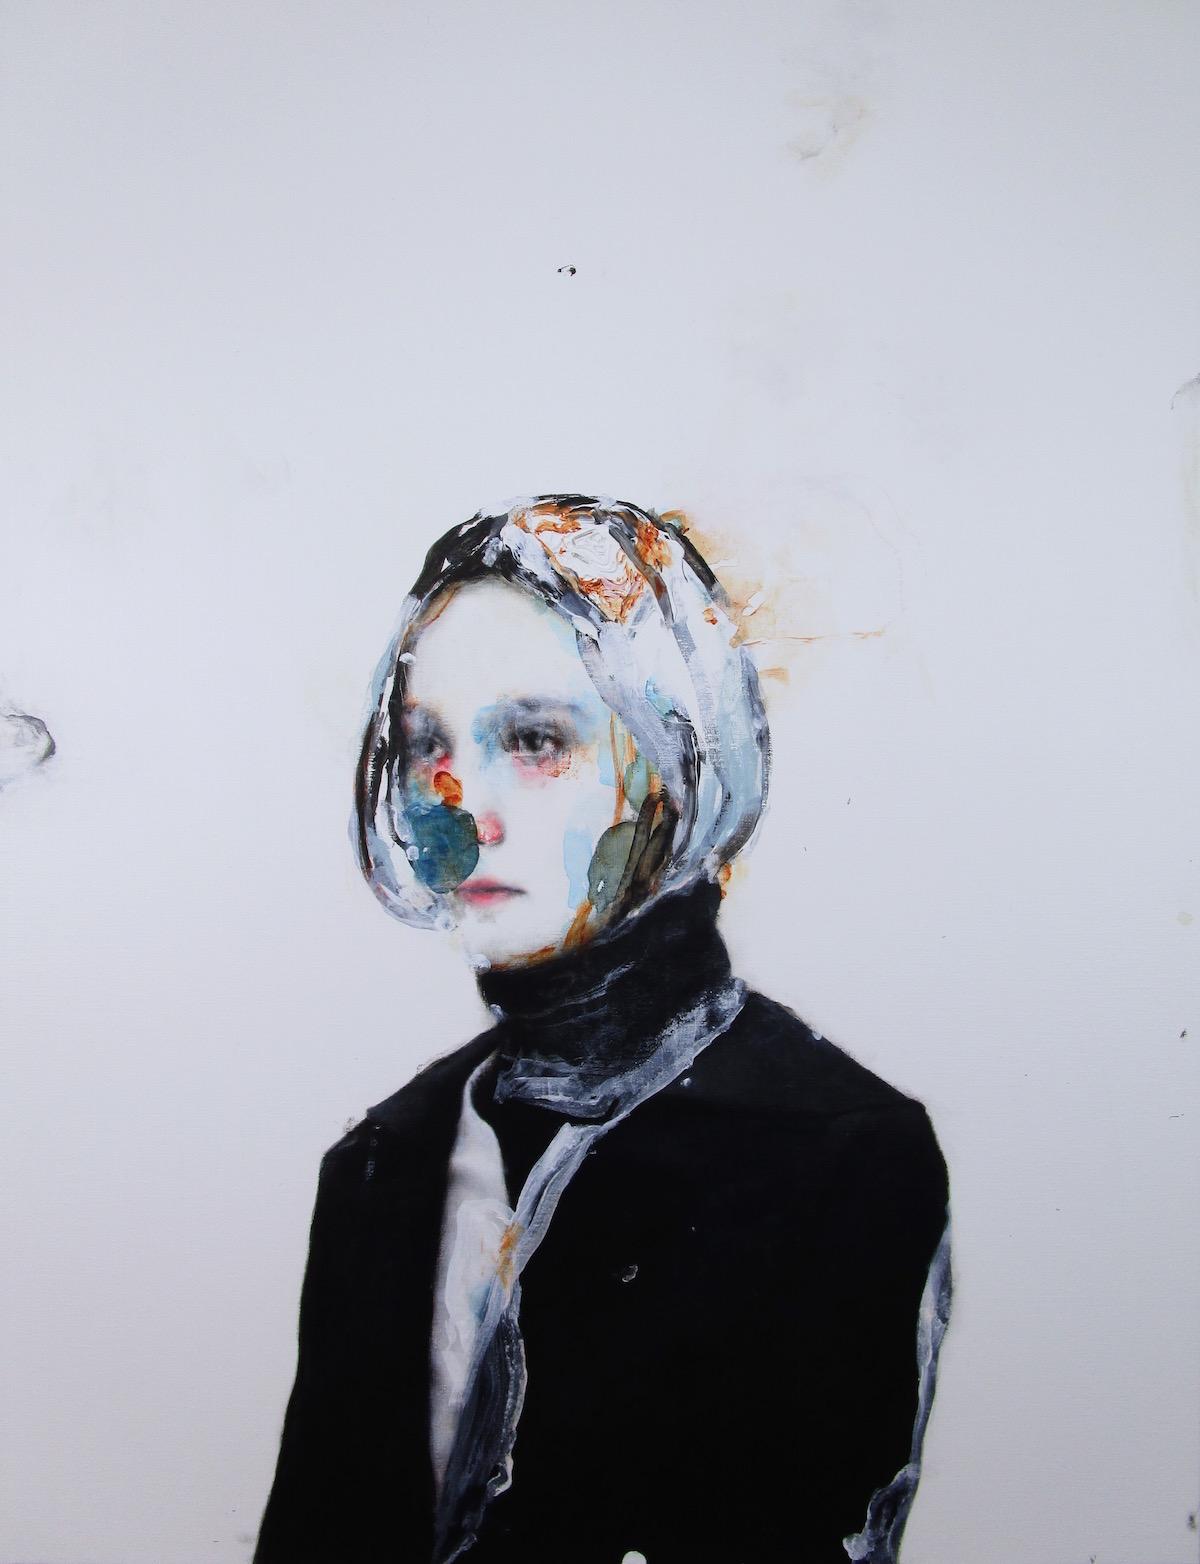 Antoine Cordet canvas toile peinture painting portrait art artist artiste peintre oil acrylic purple mood